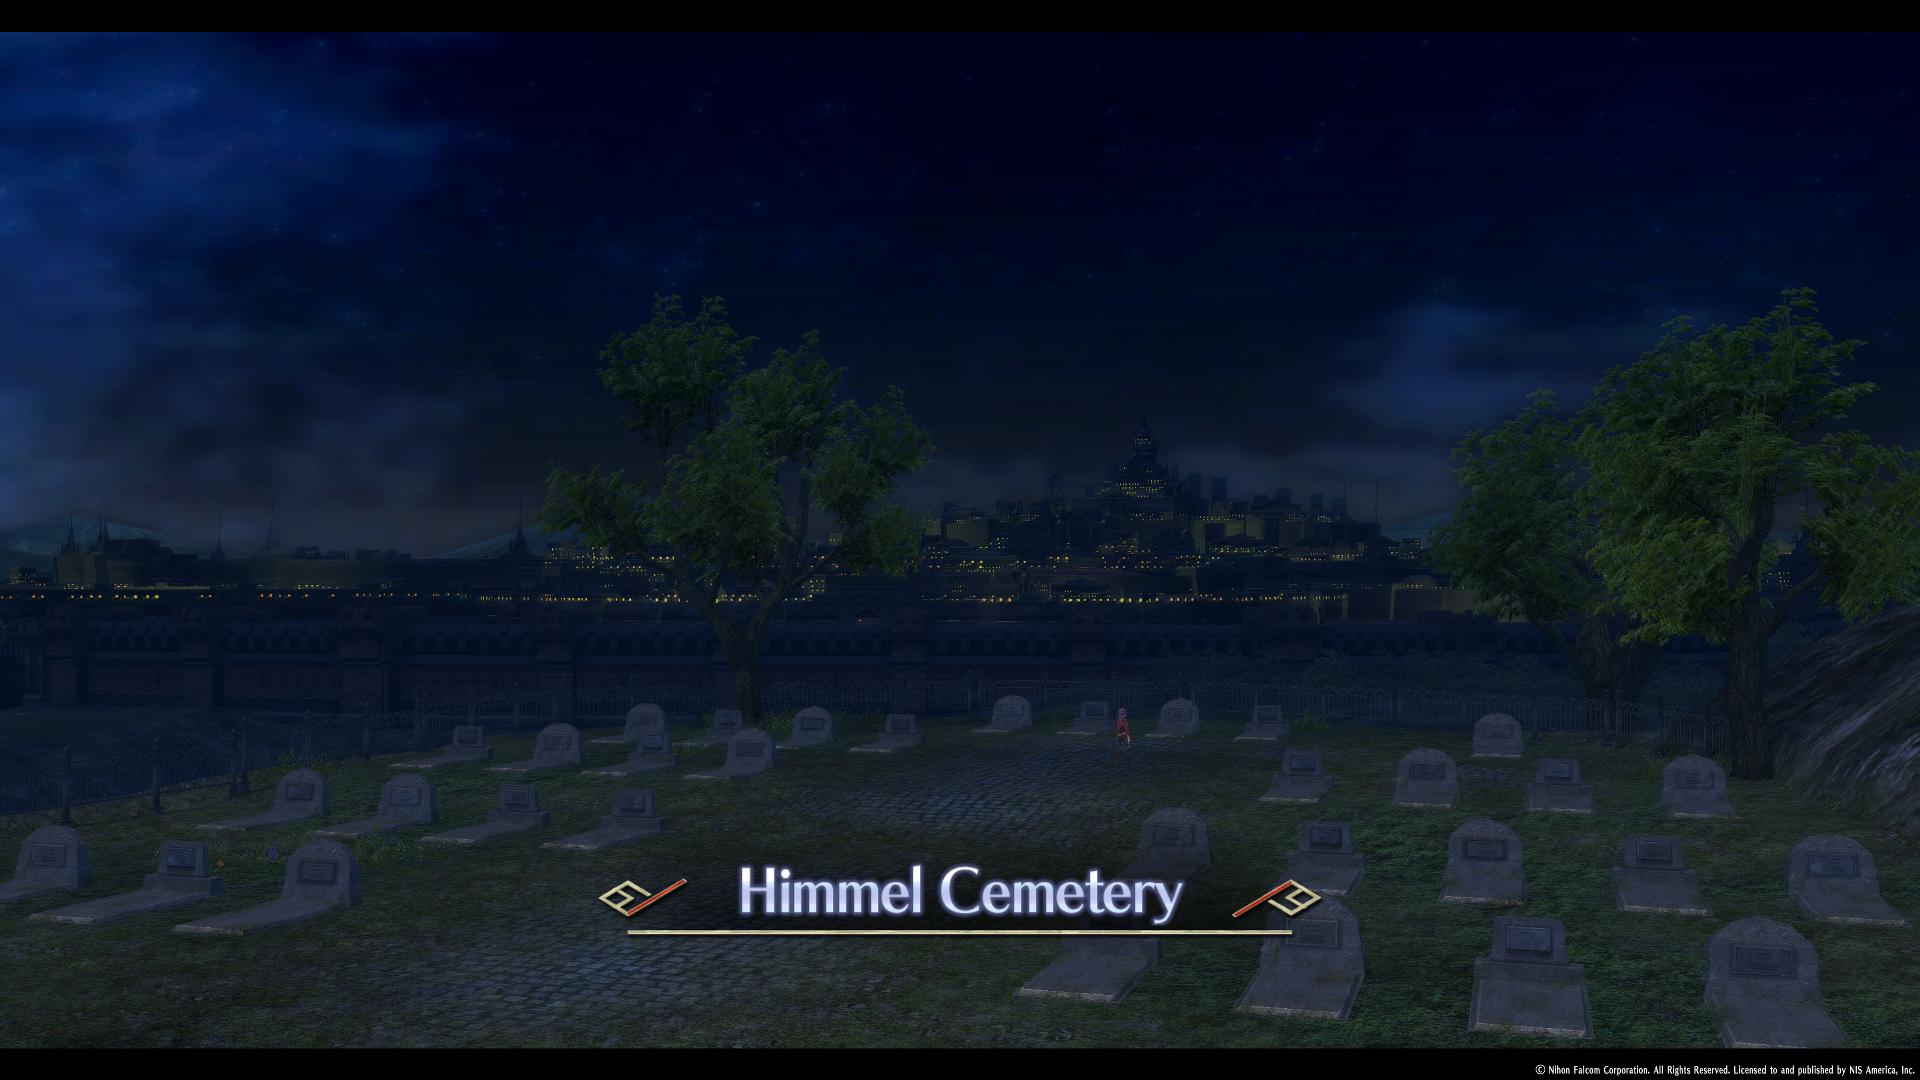 Himmel Cemetery